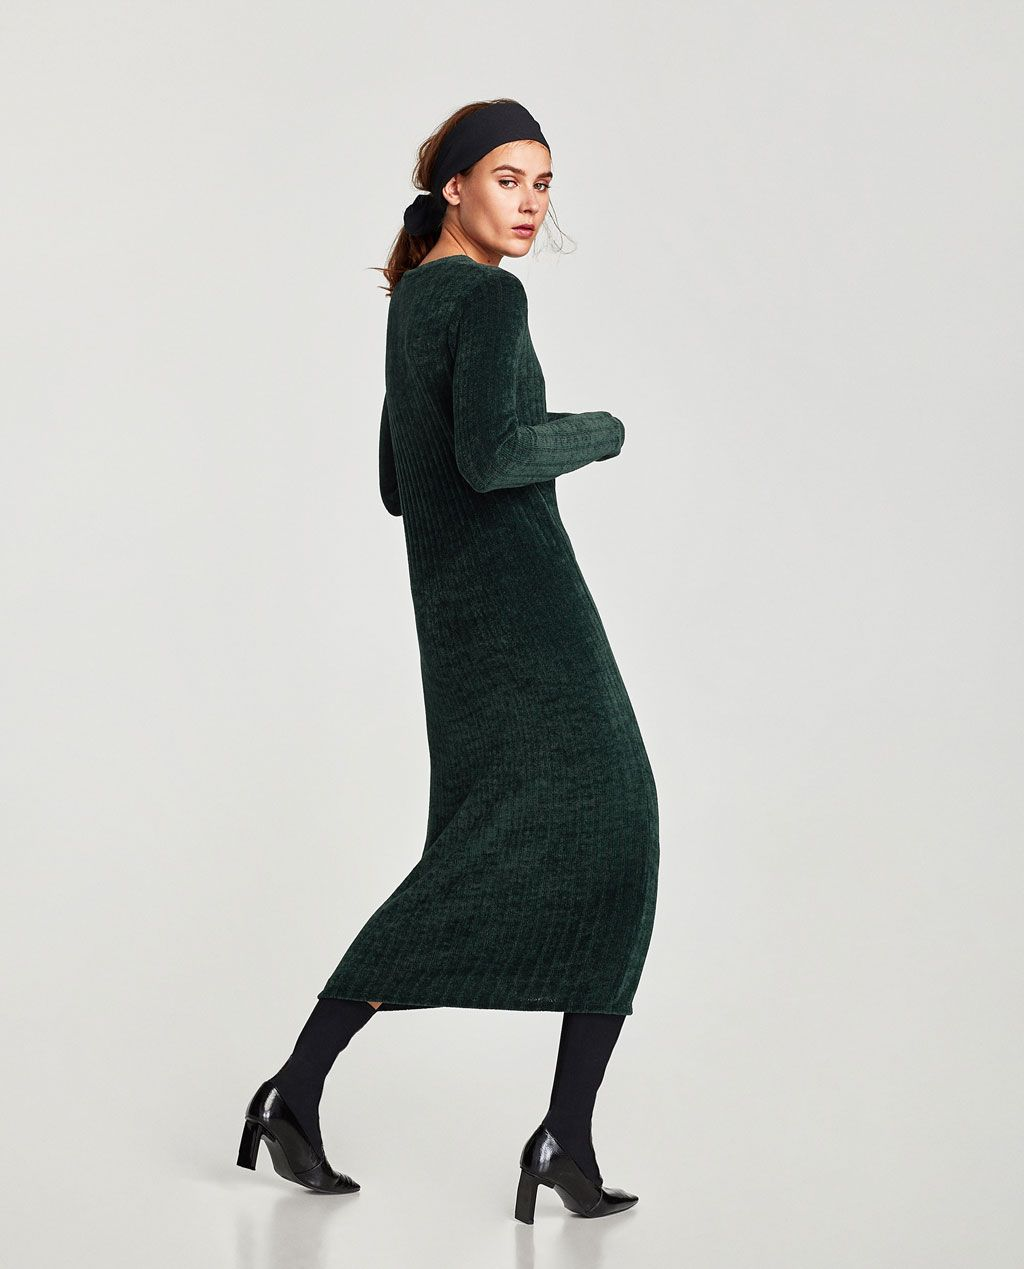 bcd30b2215 Slogan t-shirt   Style Inspiration   Dresses, Zara women, Shirts